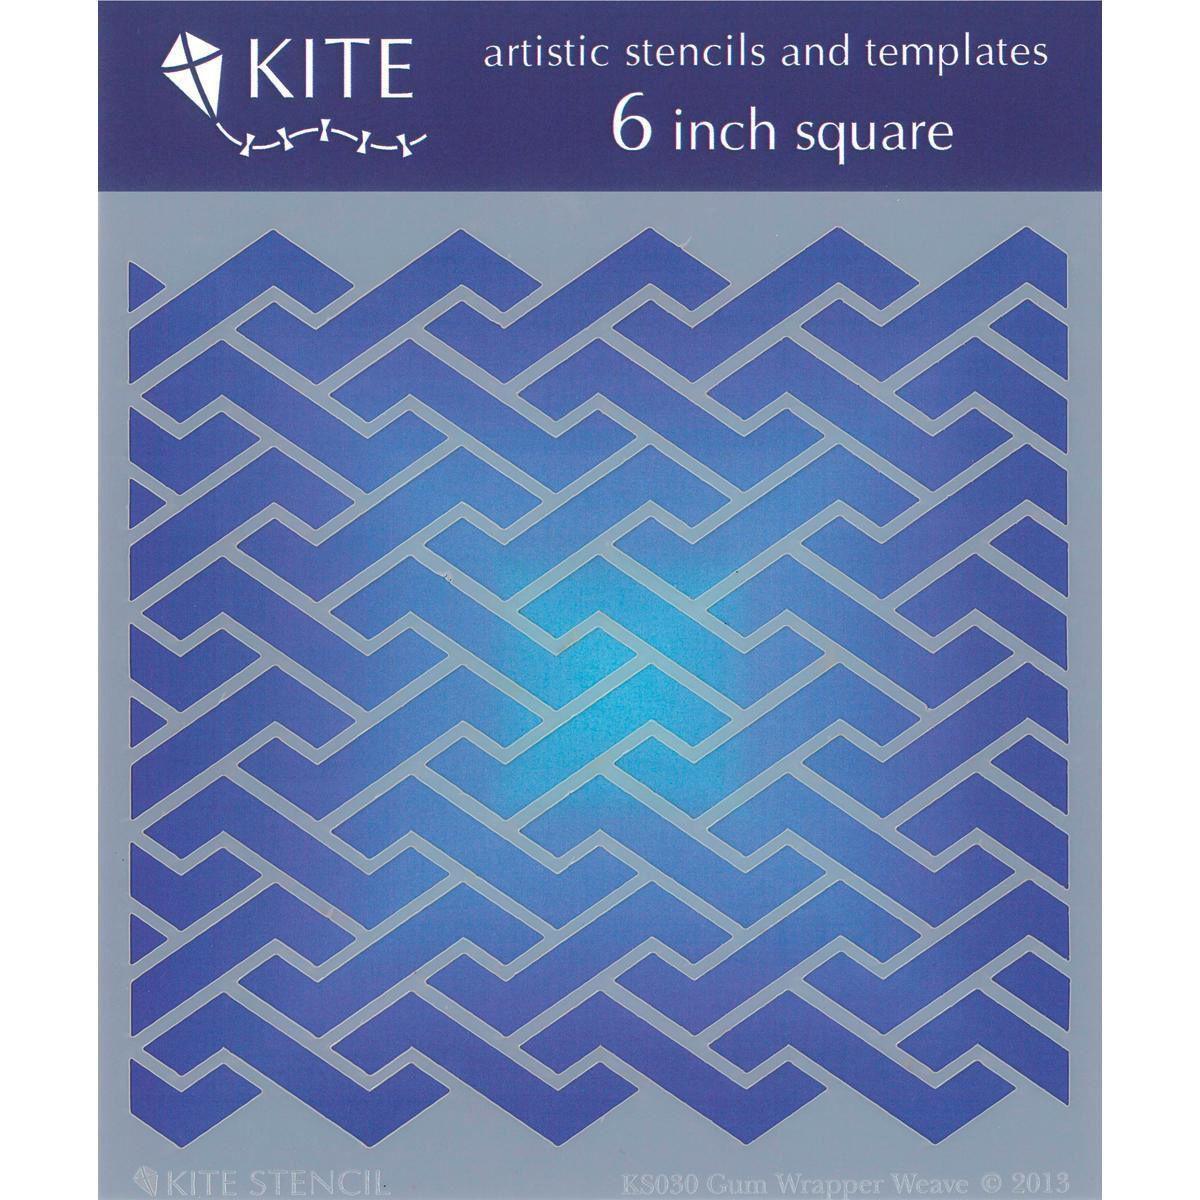 Judikins 6 Inch Square Kite Stencil - | Products | Pinterest | Kites ...